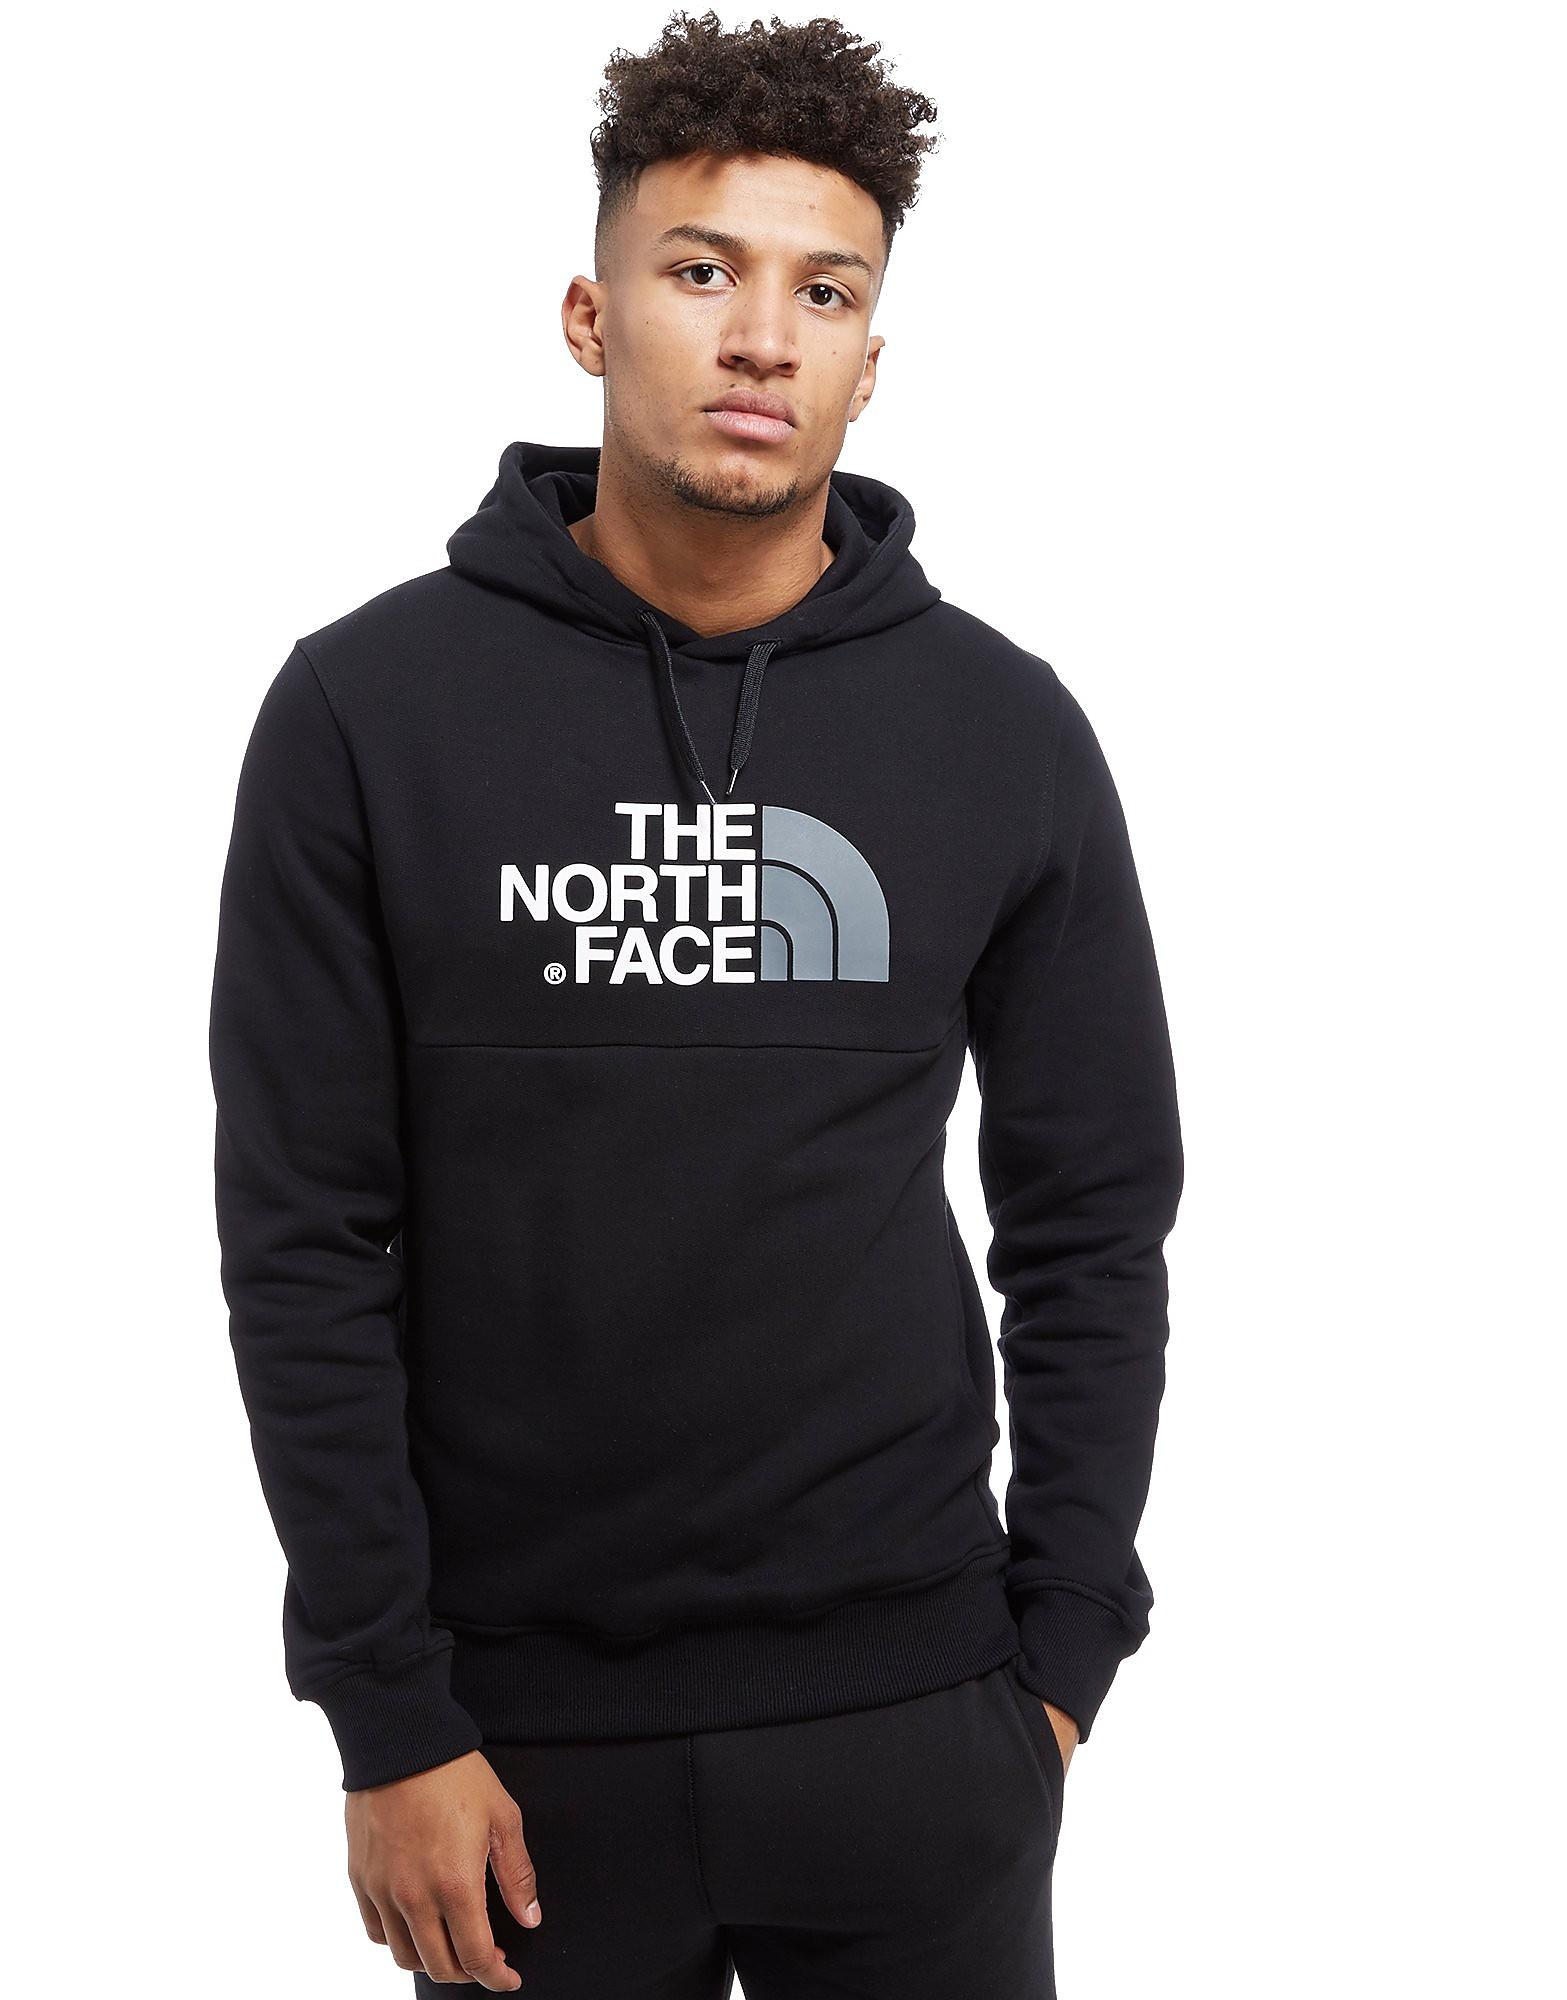 The North Face Bondi 17 Fleece Hoody